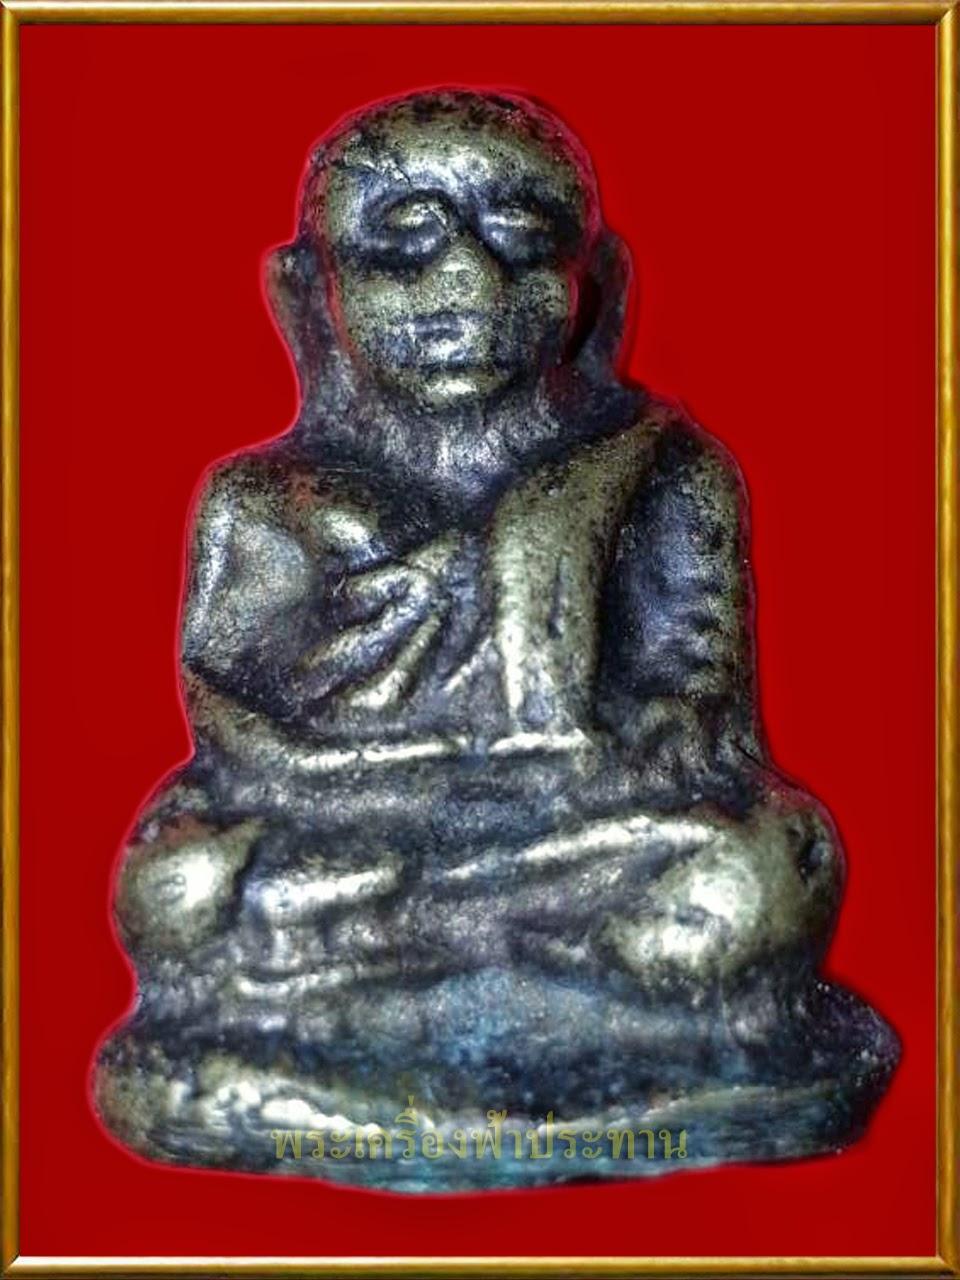 http://tubtimthong-amulet.blogspot.com/2014/12/blog-post_21.html